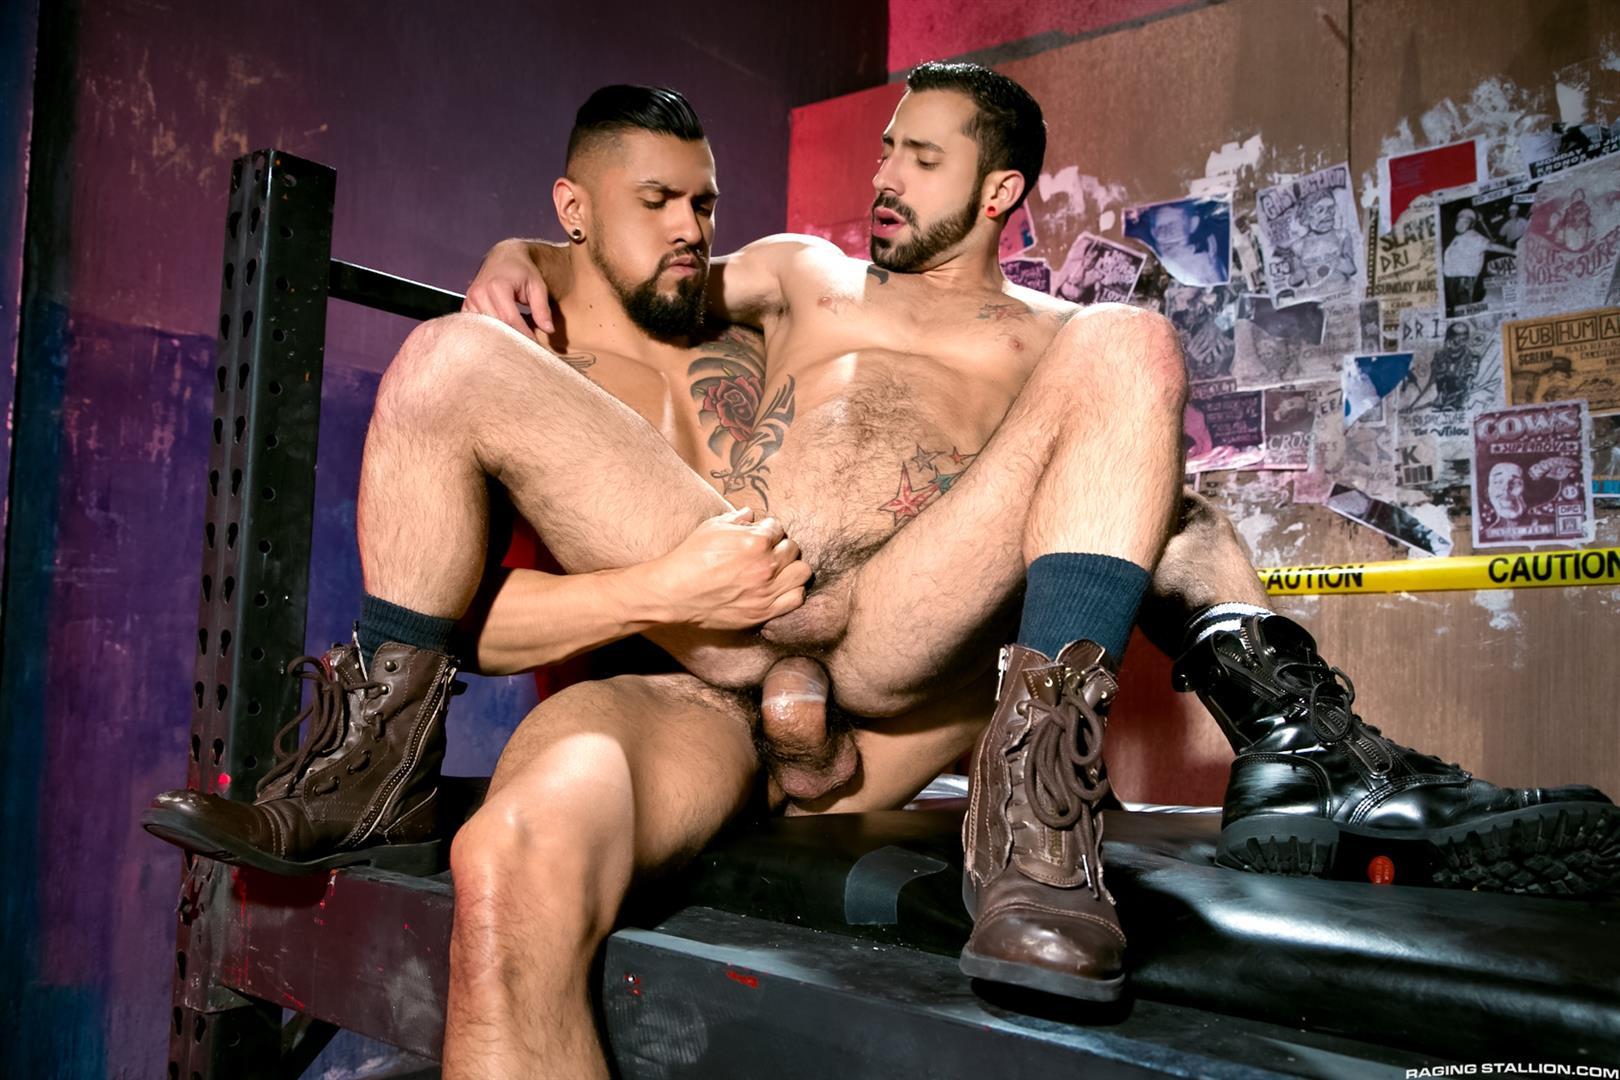 Raging Stallion Boomer Banks and Nick Cross Huge Uncut Cock Fucking A Latino Ass Amateur Gay Porn 11 Boomer Banks Fucking Nick Cross With His Huge Uncut Cock